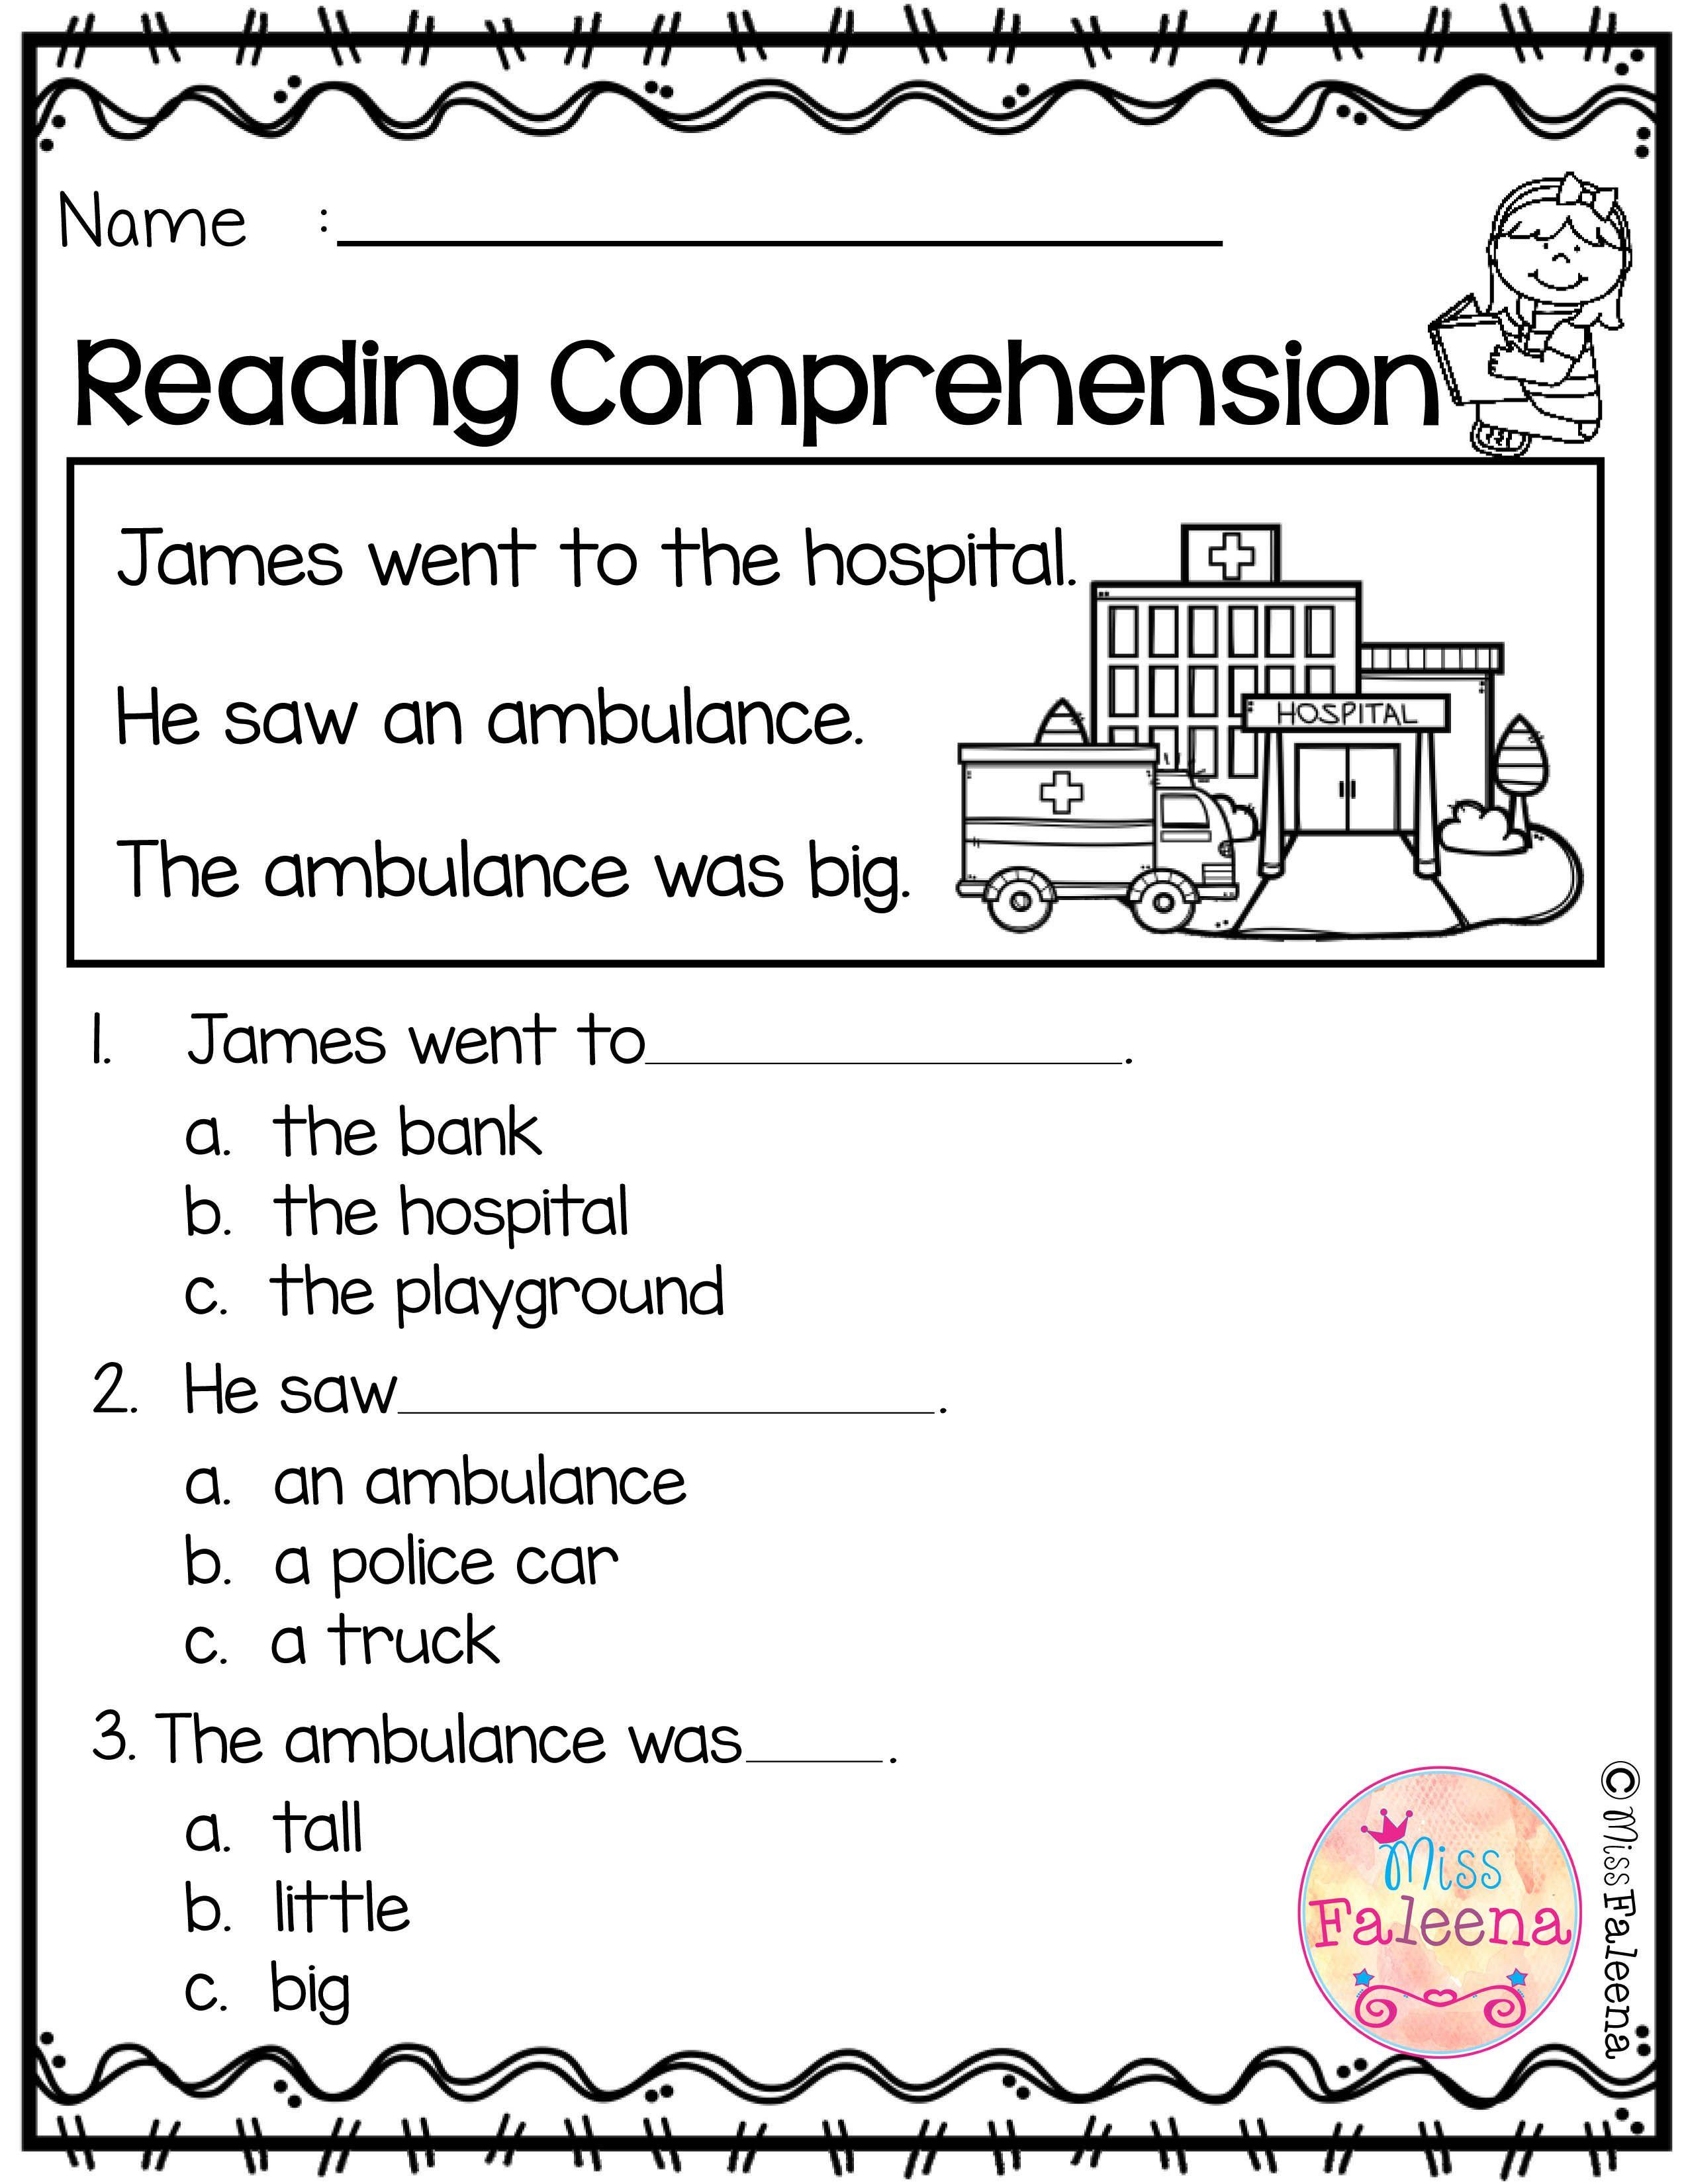 worksheet Reading Comprehension Worksheets Kindergarten free reading comprehension is suitable for kindergarten students or beginning readers there are 15 color